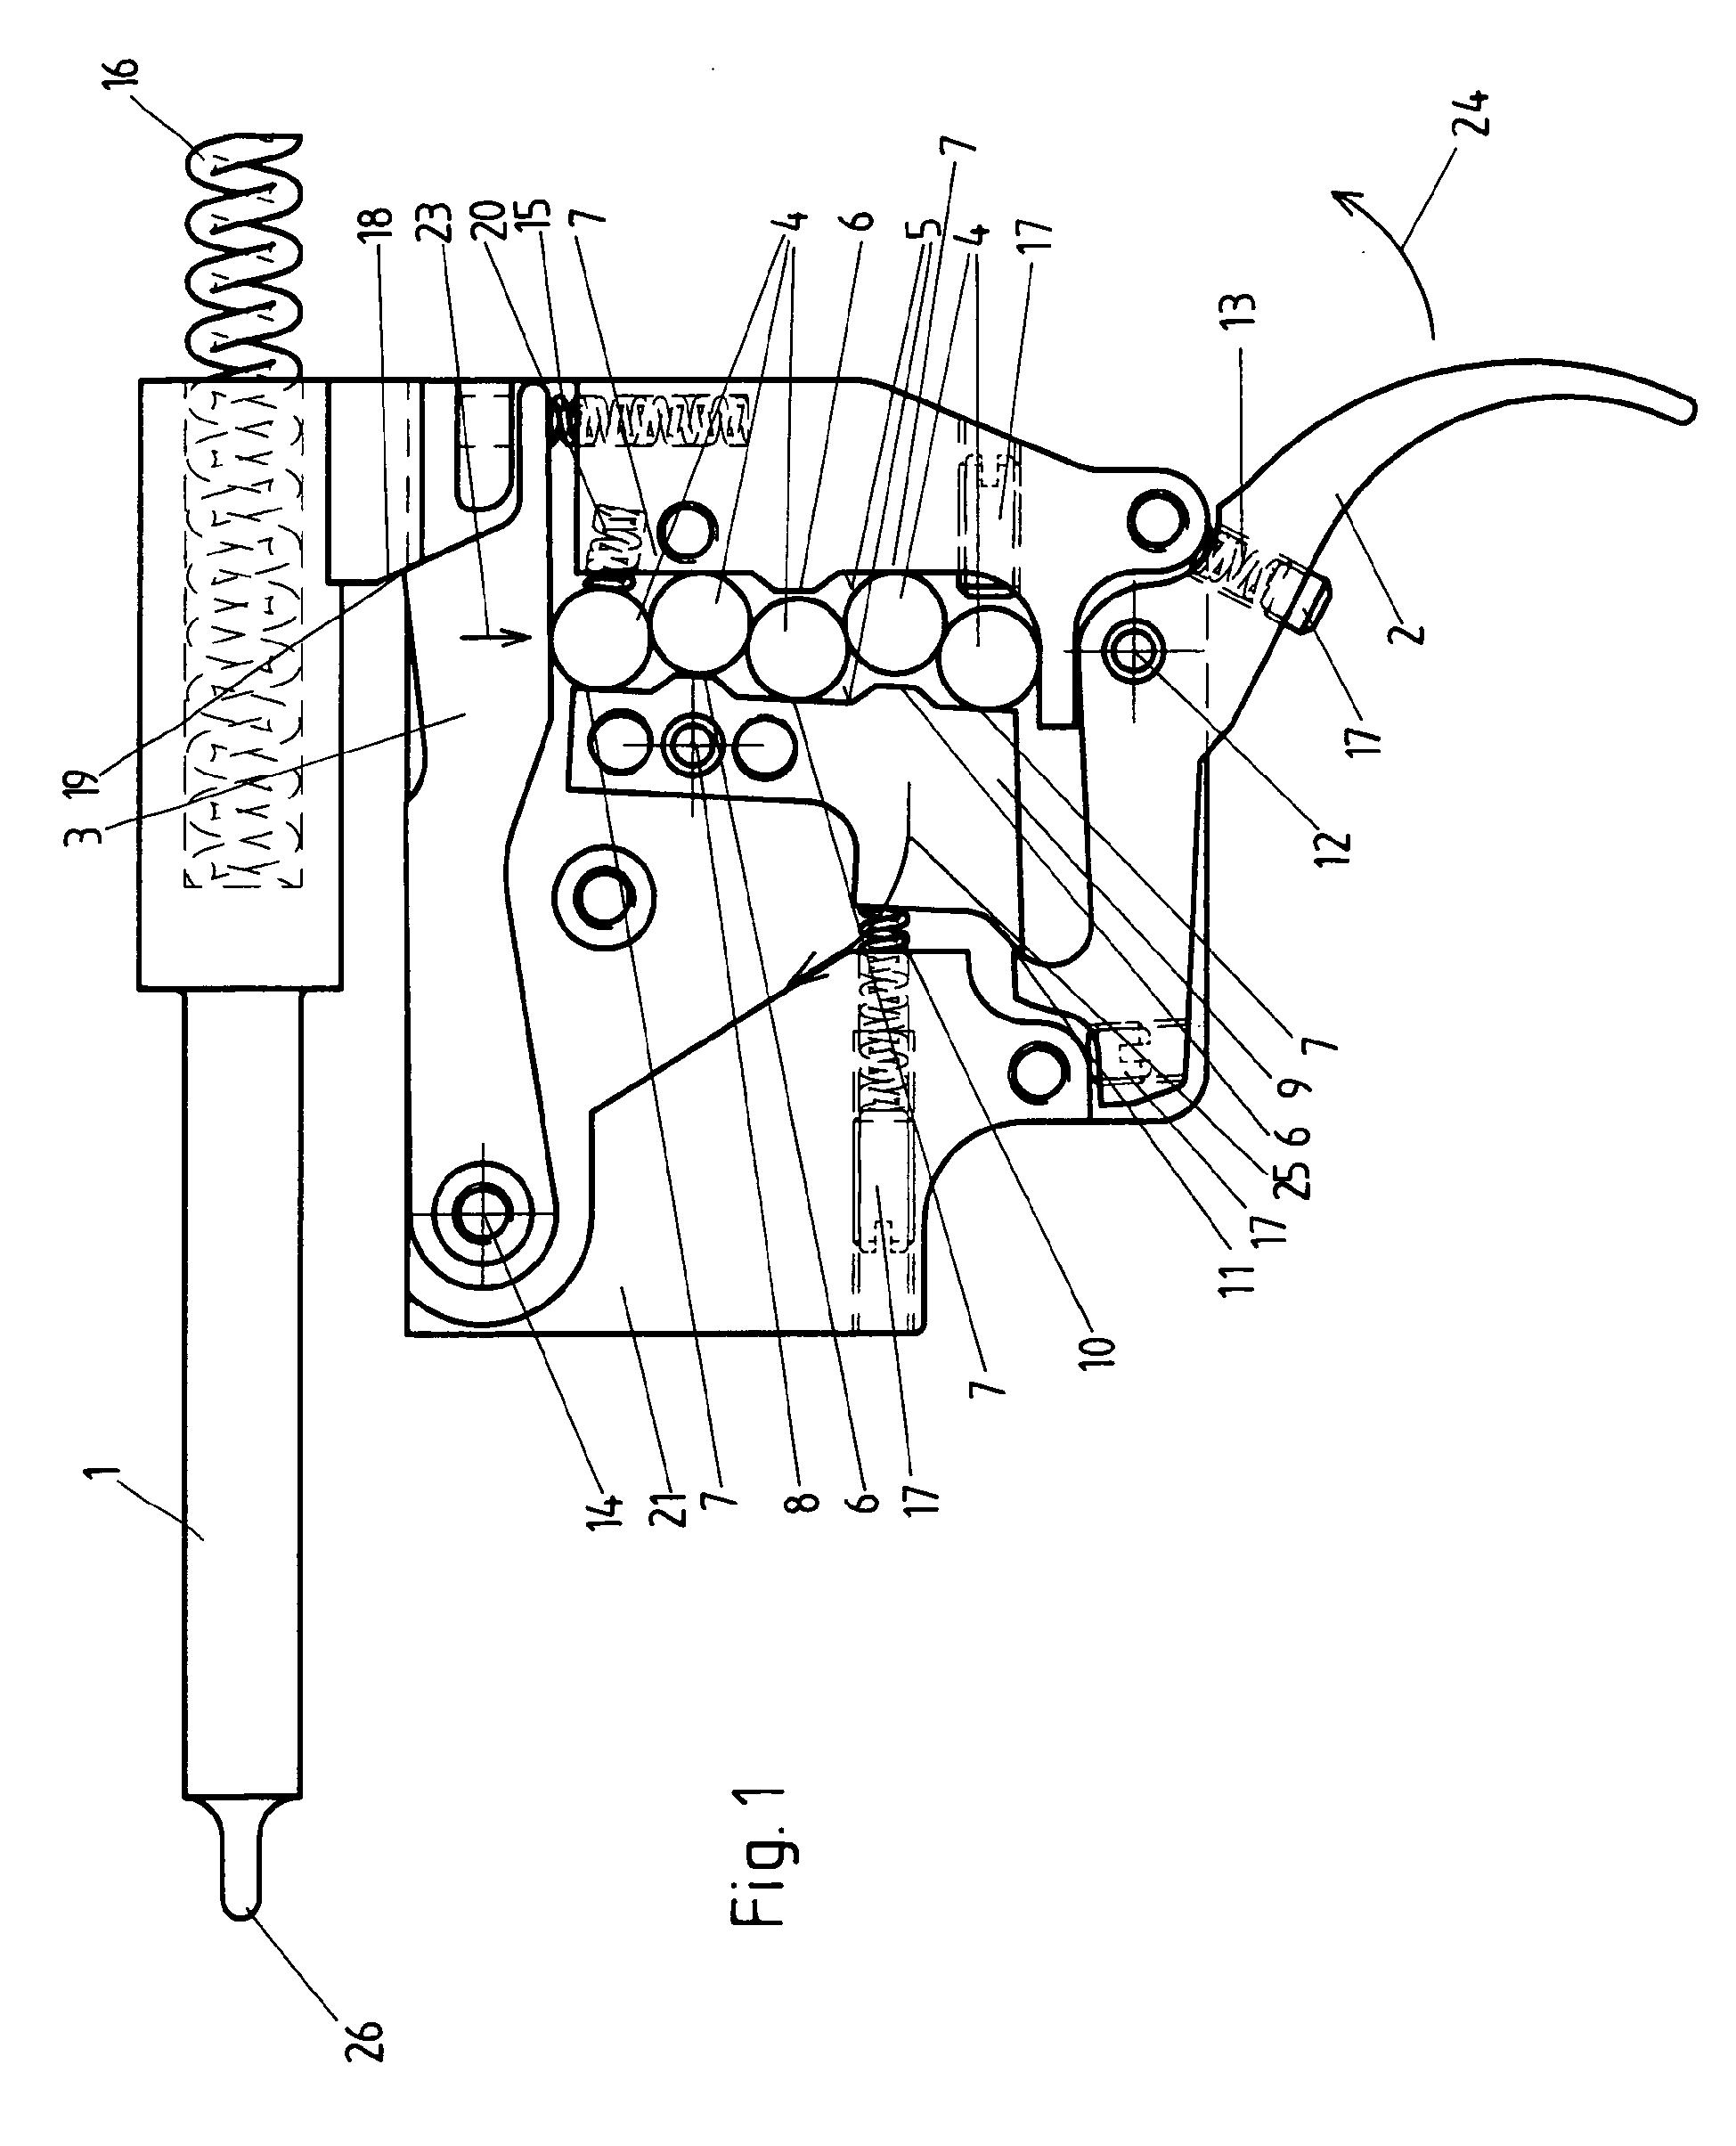 Patent ep2314974a2 trigger mechanism patents blue guitar schematics